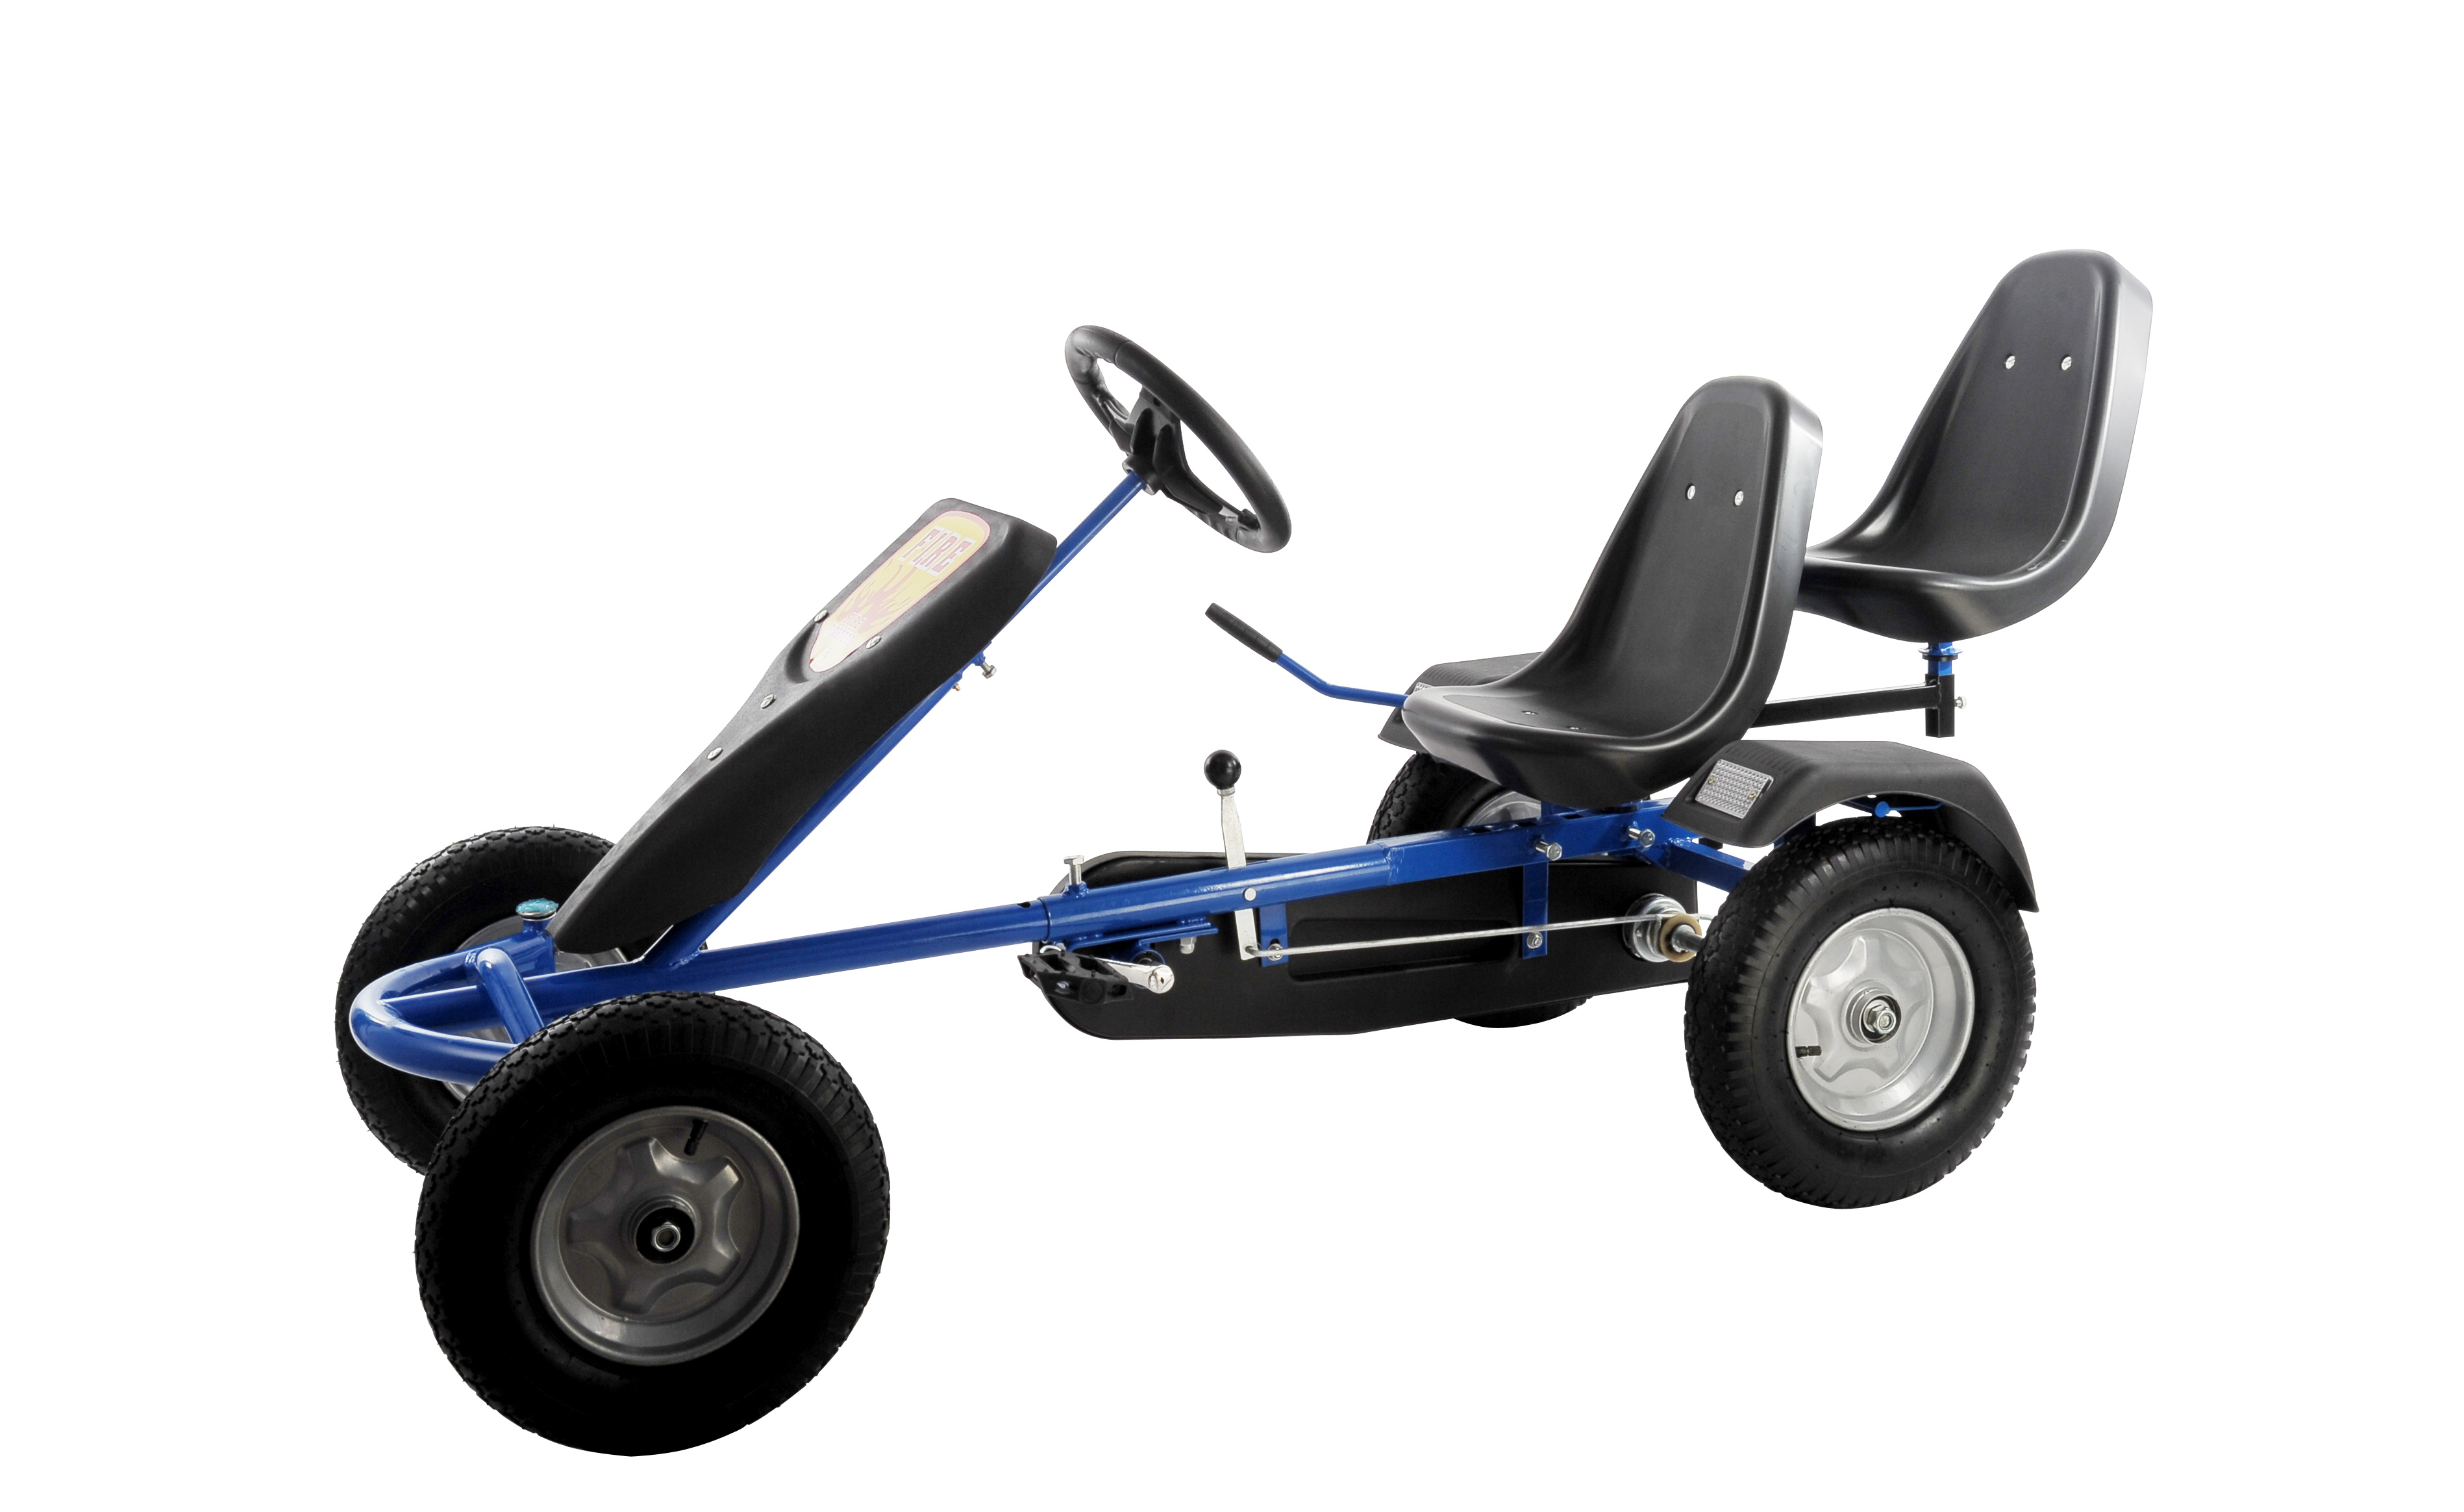 sixbros pedal riesen gokart 2 sitzer gocart tretauto tretfahrzeug f160ab 695 ebay. Black Bedroom Furniture Sets. Home Design Ideas